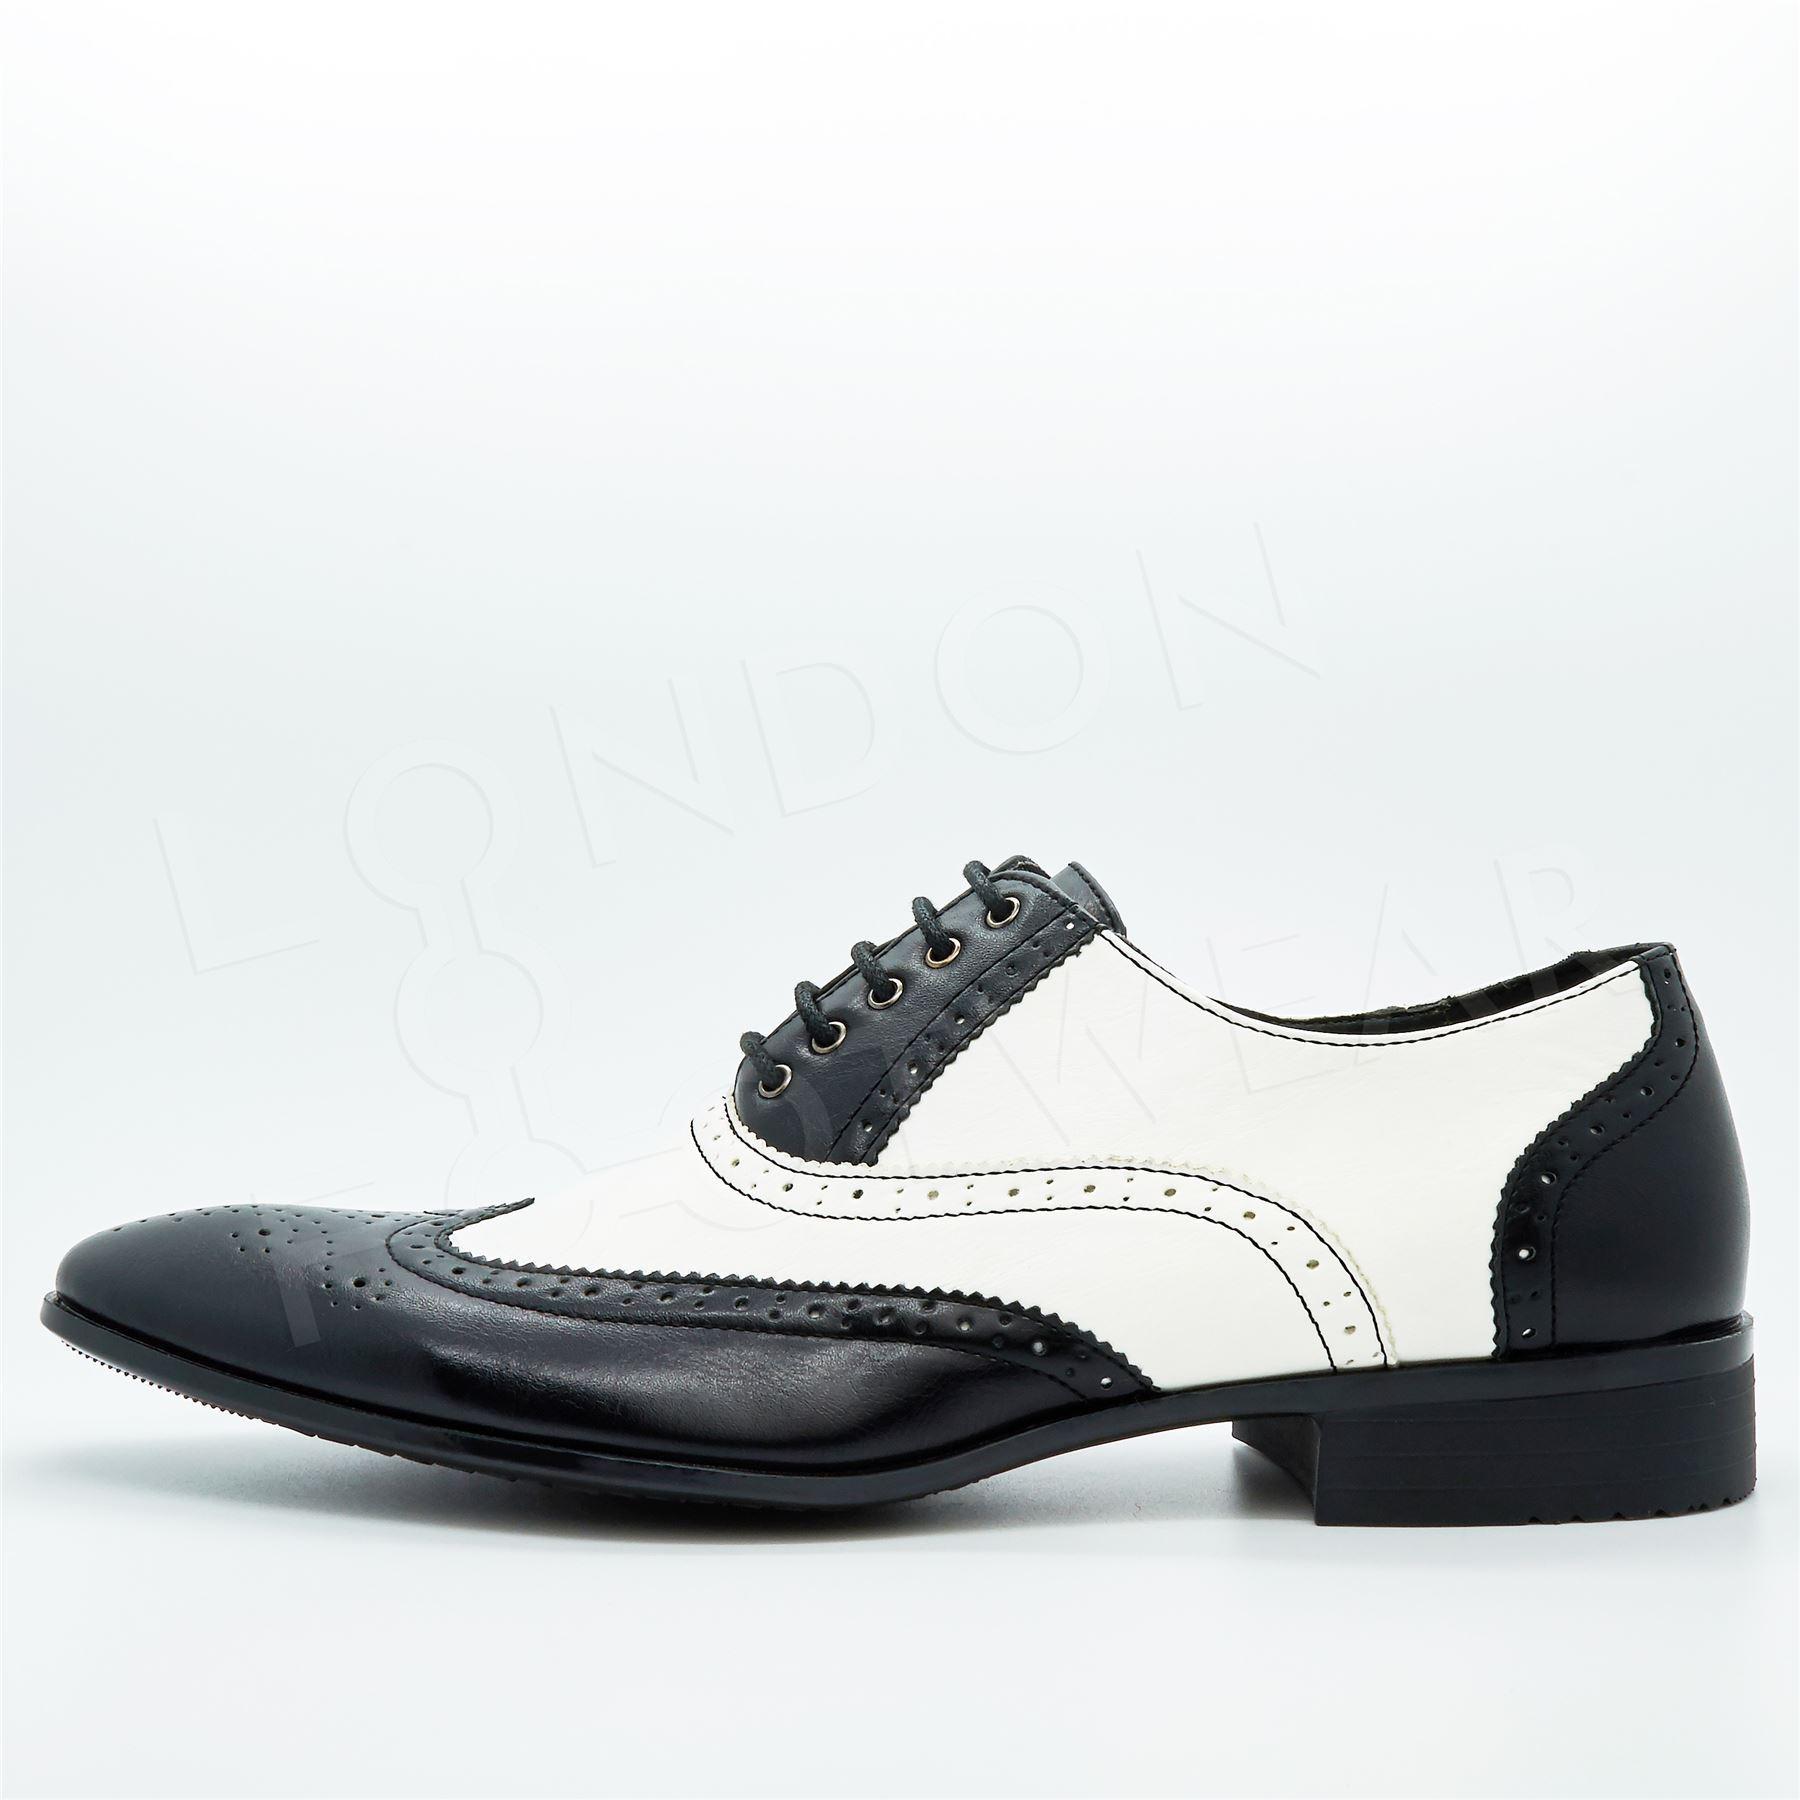 Mens Spats Shoes Uk